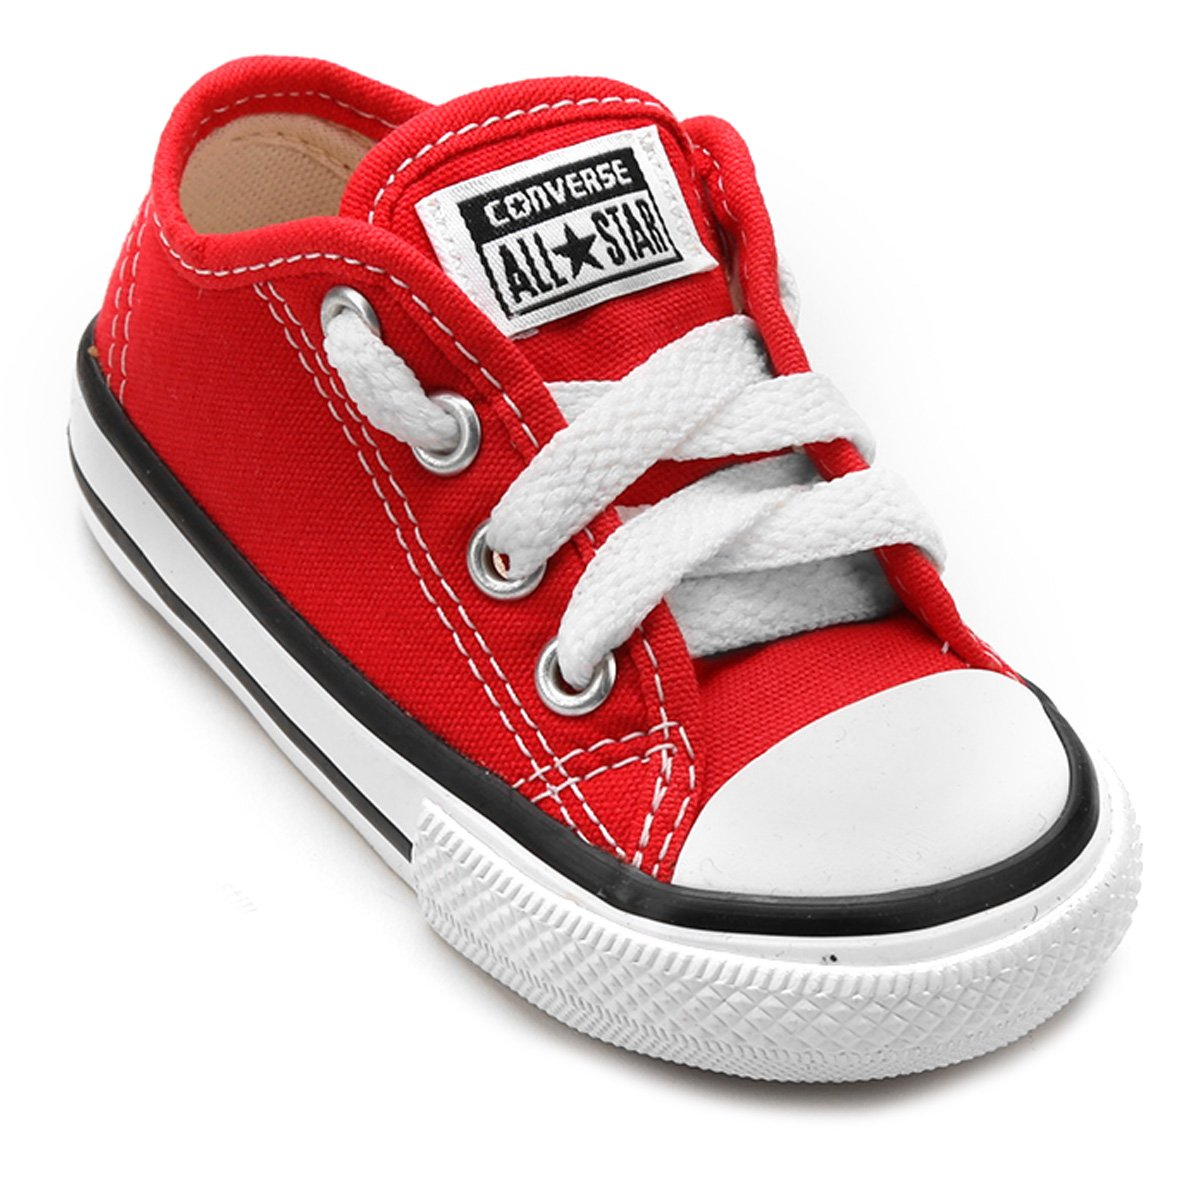 3d2061d53a6 Tênis Infantil Converse All Star Chuck Taylor Border Baby